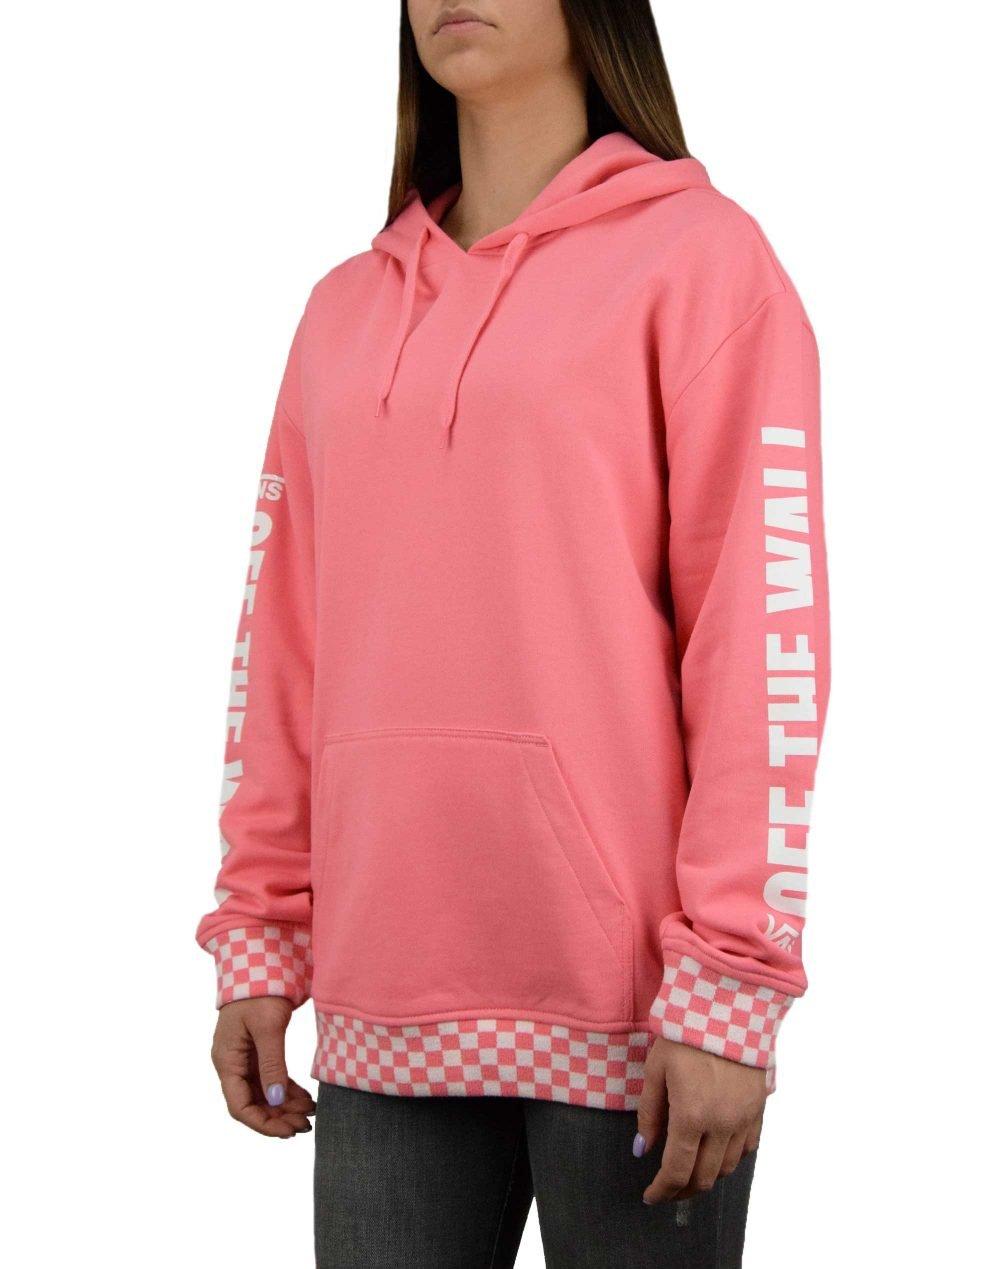 Vans Centrl Hoodie Strawberry Pink(VA4BGSUV6)